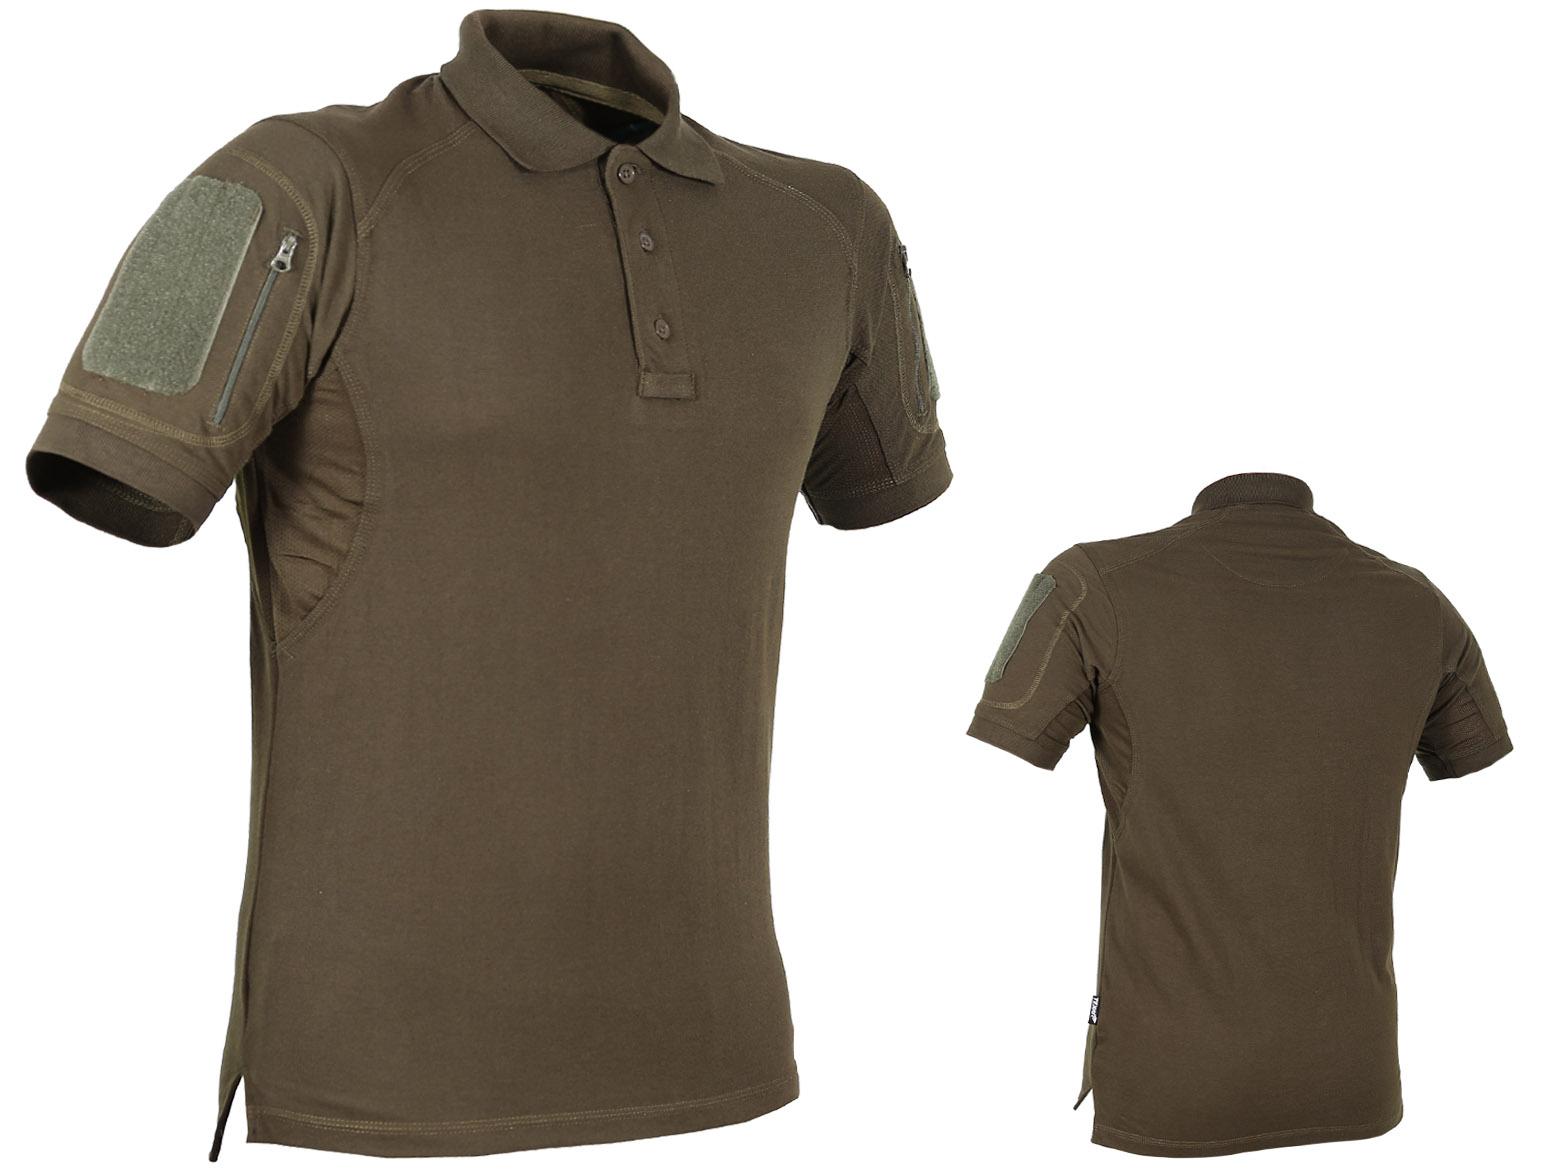 ba7eb699ce6b03 TEXAR ELITE PRO Koszulka Taktyczna Polo OLIVE M - 7294784913 ...